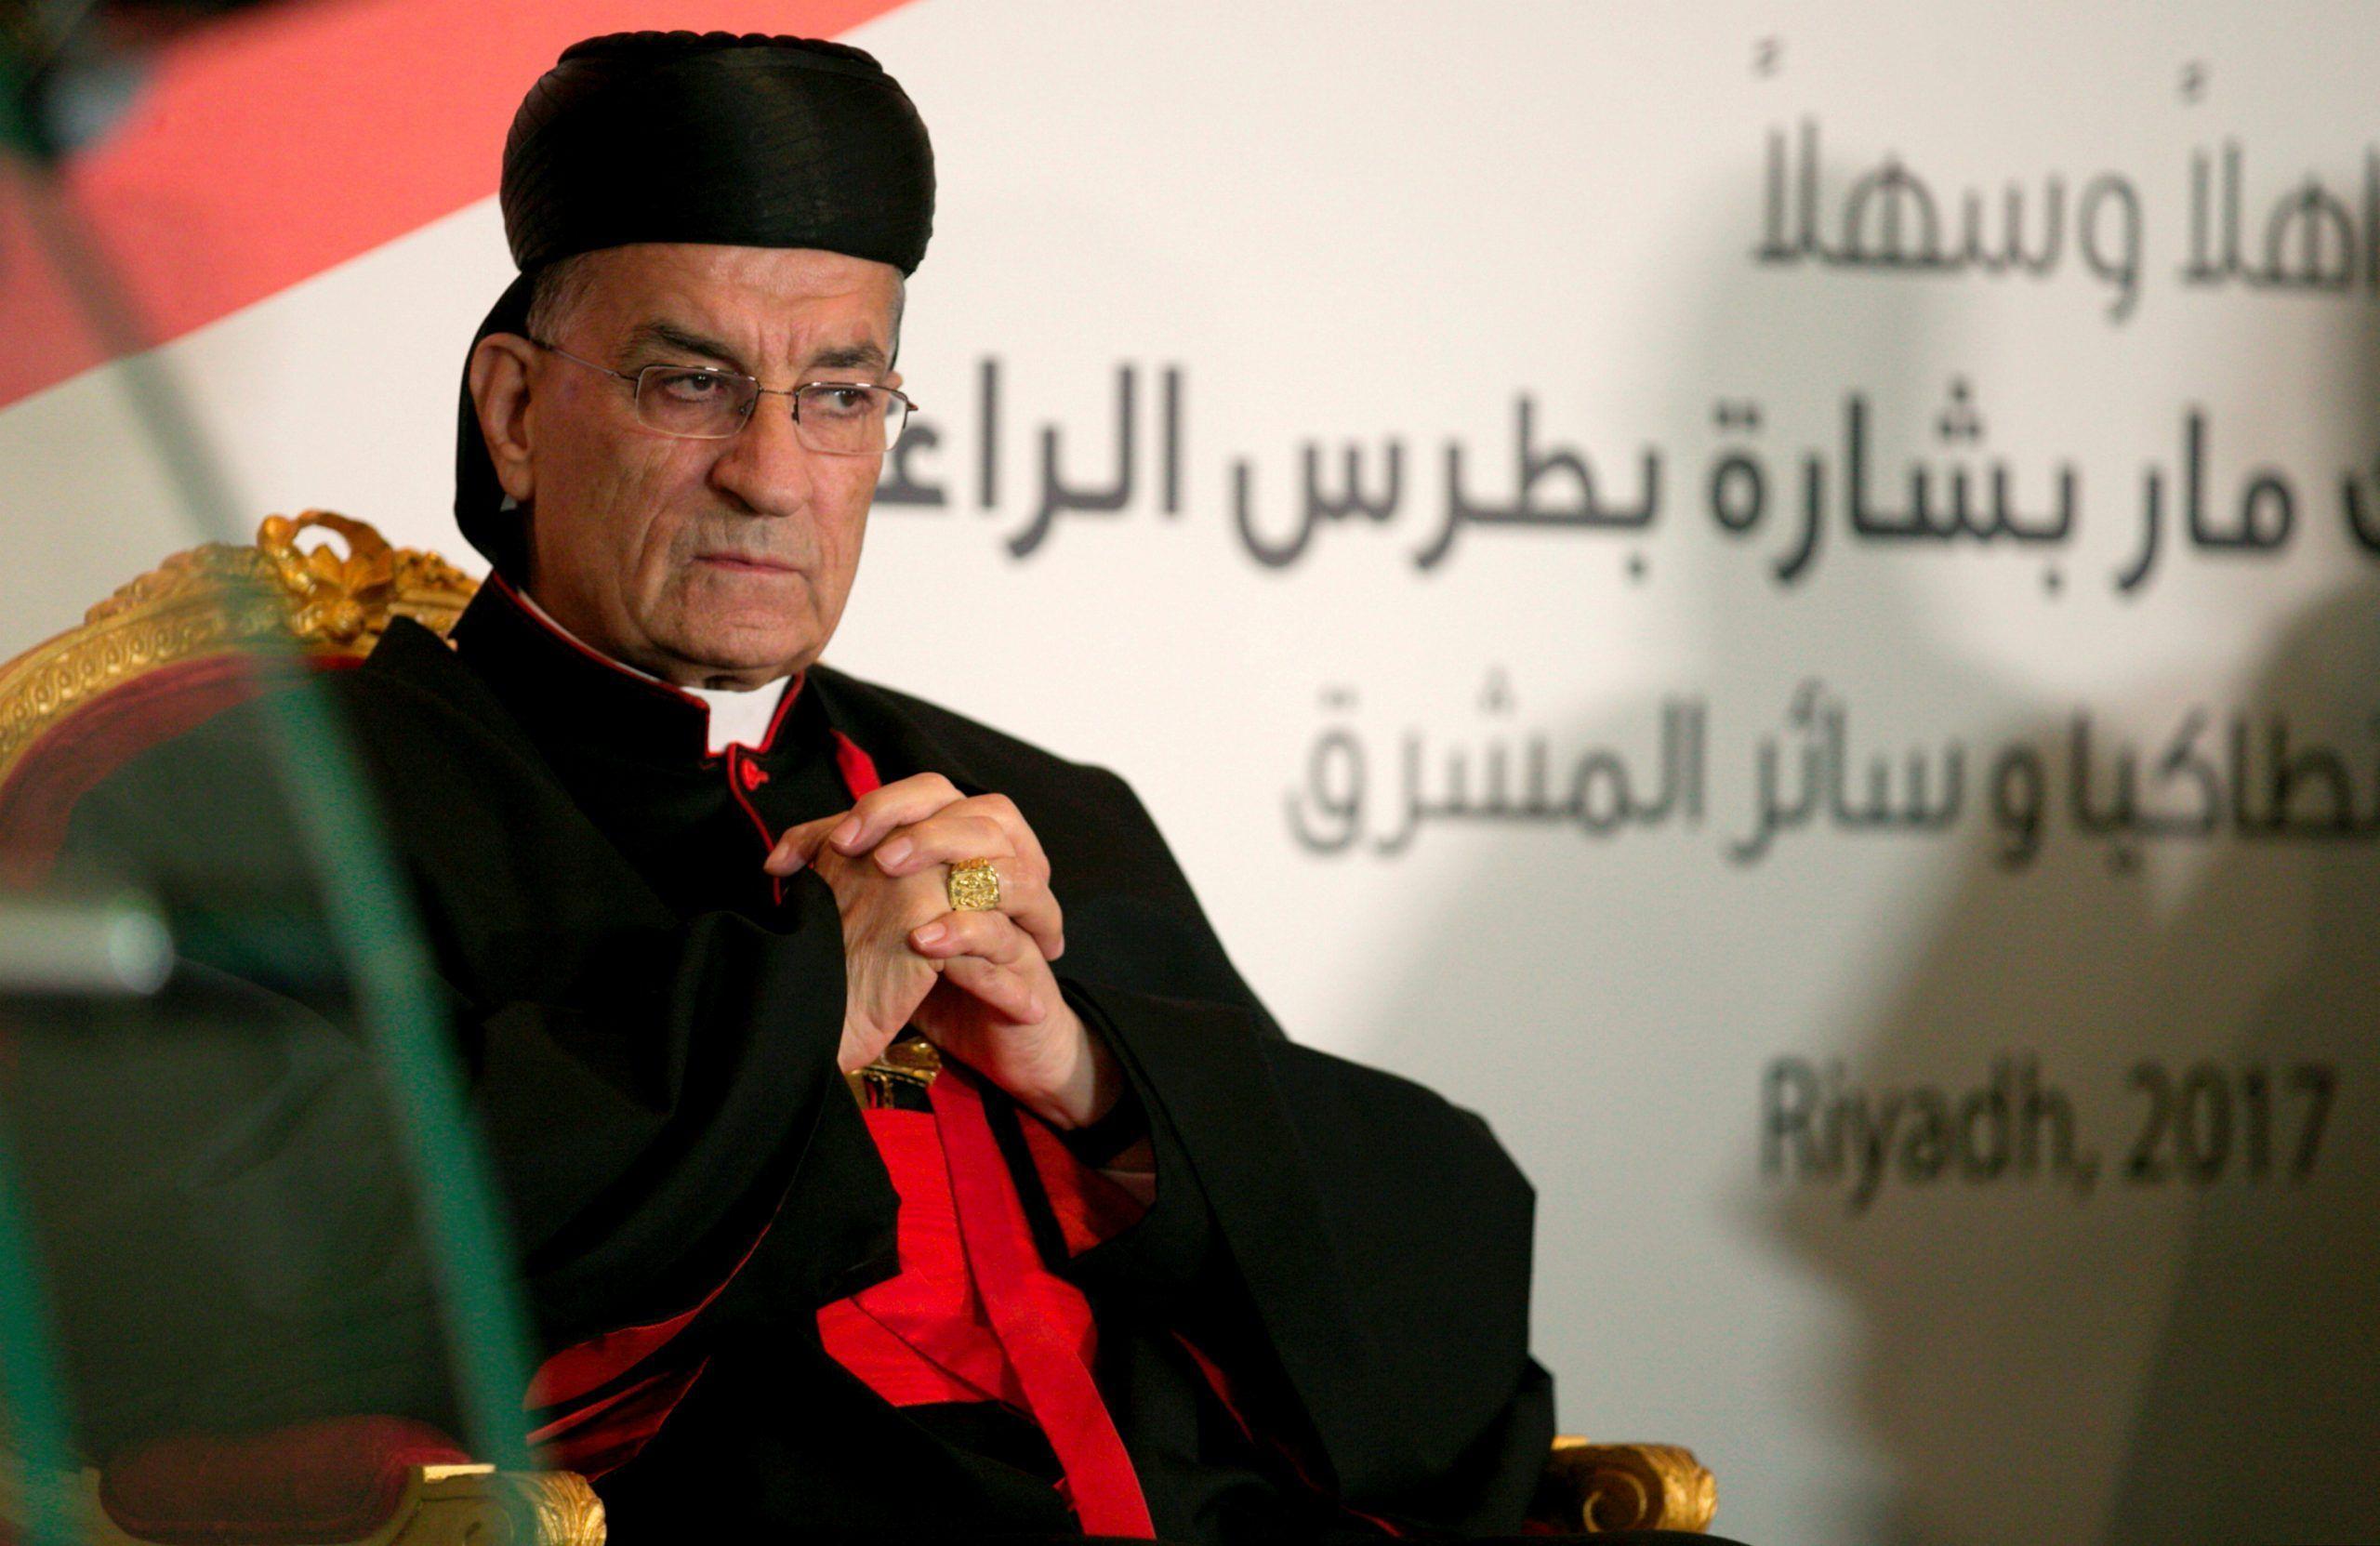 FILE PHOTO: Lebanese Maronite Patriarch Bechara Boutros Al-Rai. REUTERS/Faisal Al Nasser.